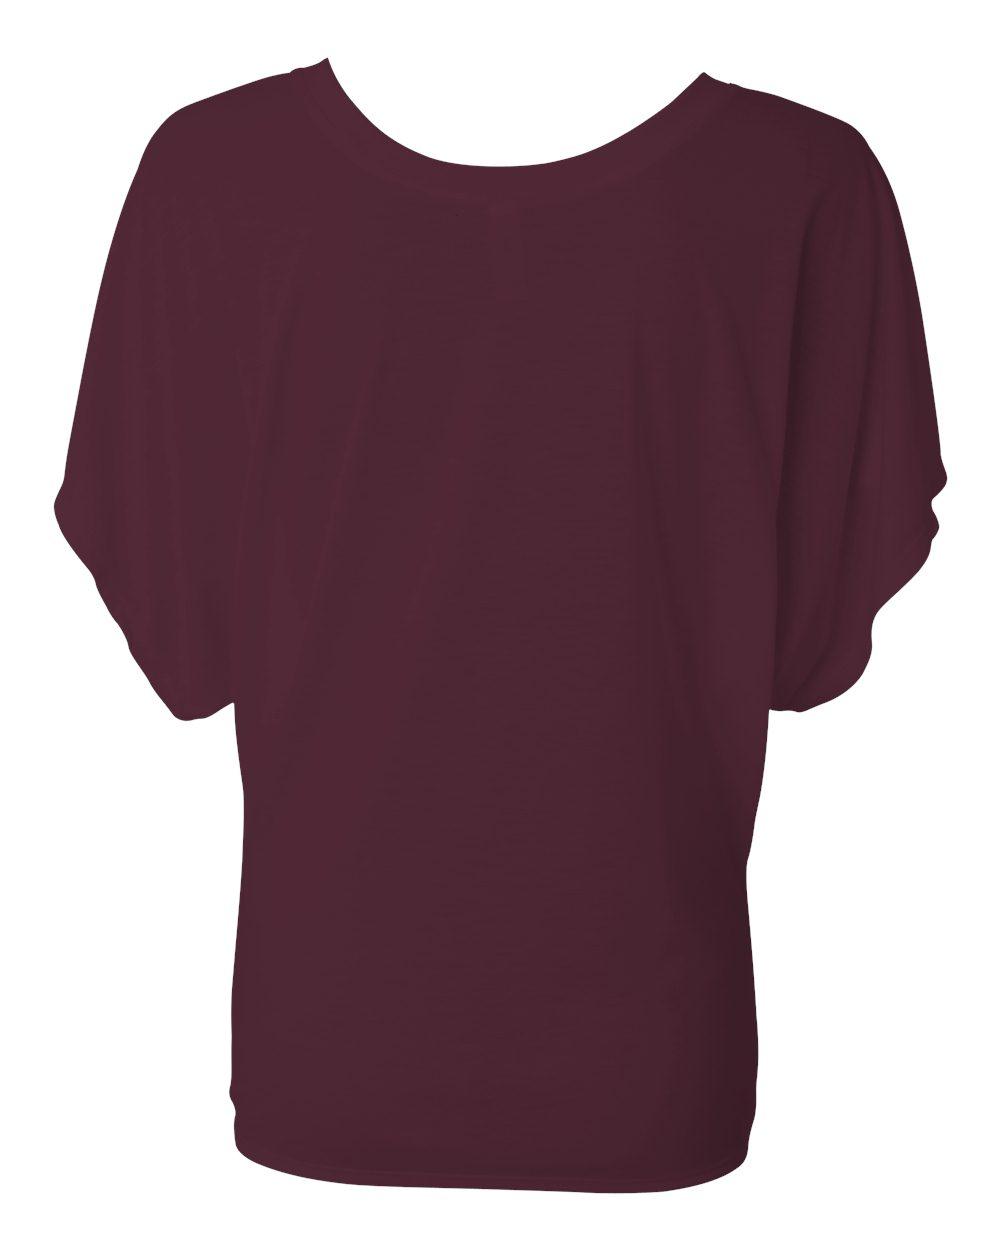 Bella-Canvas-Women-039-s-Flowy-Draped-Sleeve-Dolman-T-Shirt-8821-S-2XL thumbnail 13